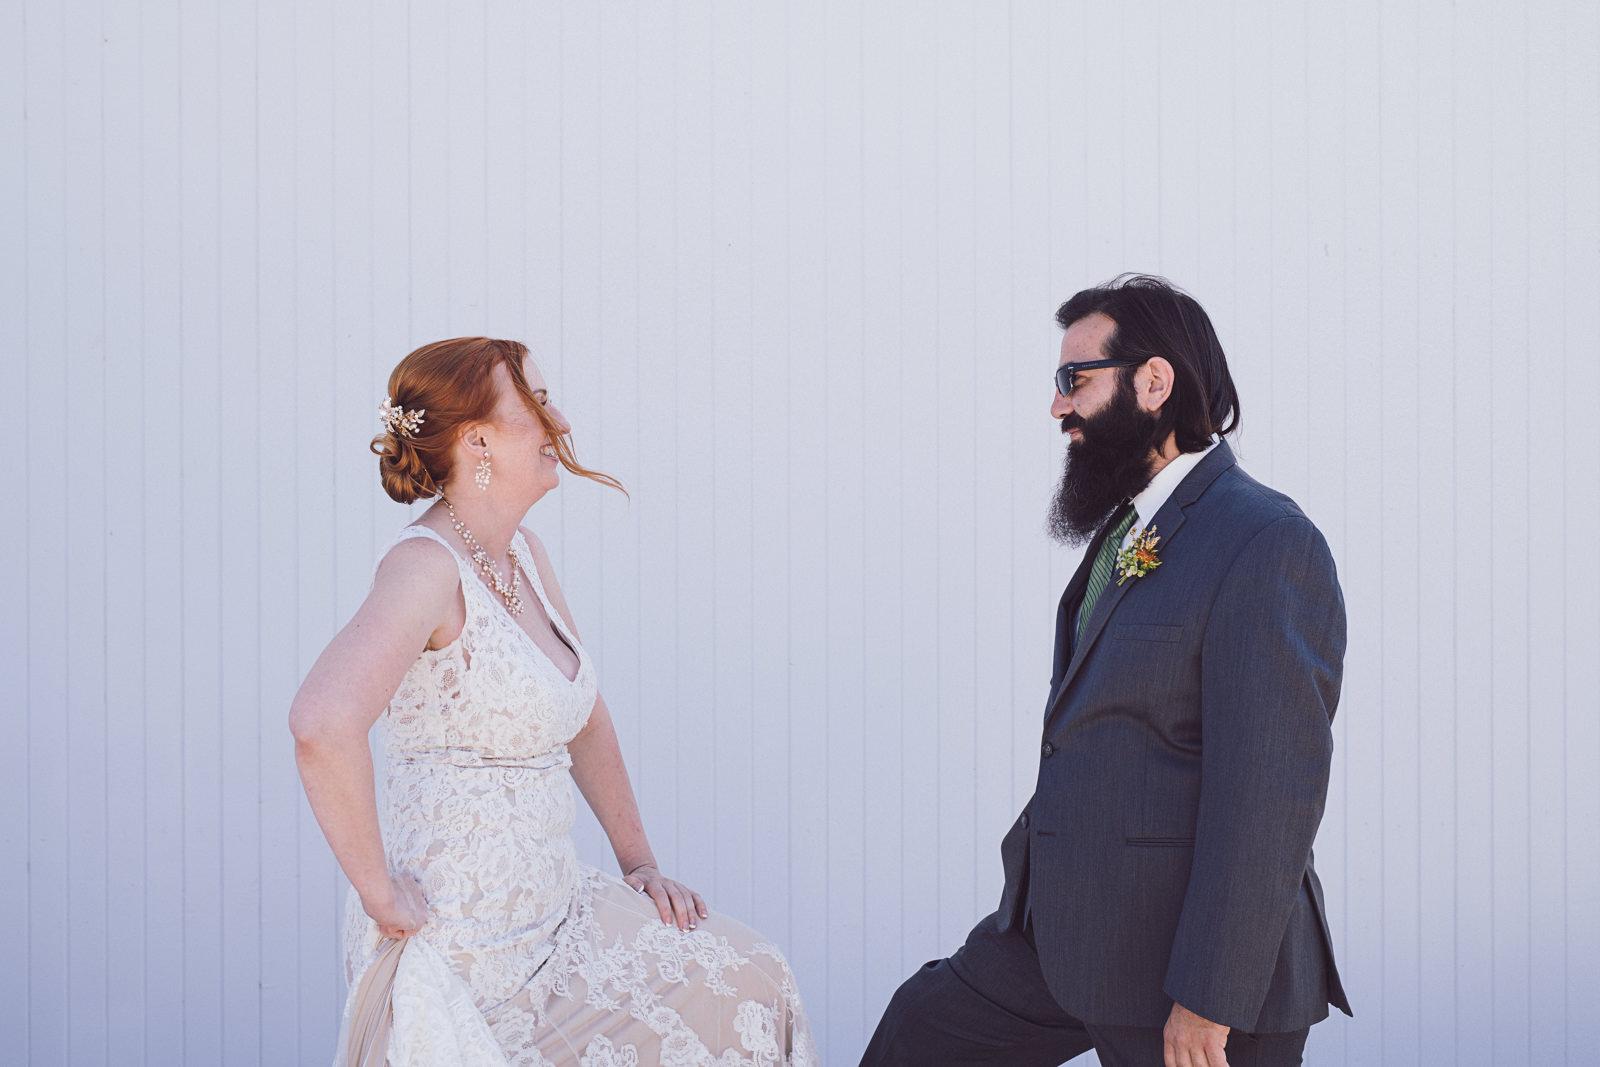 wedding-keely-caleb-919-name-your-photo.jpg